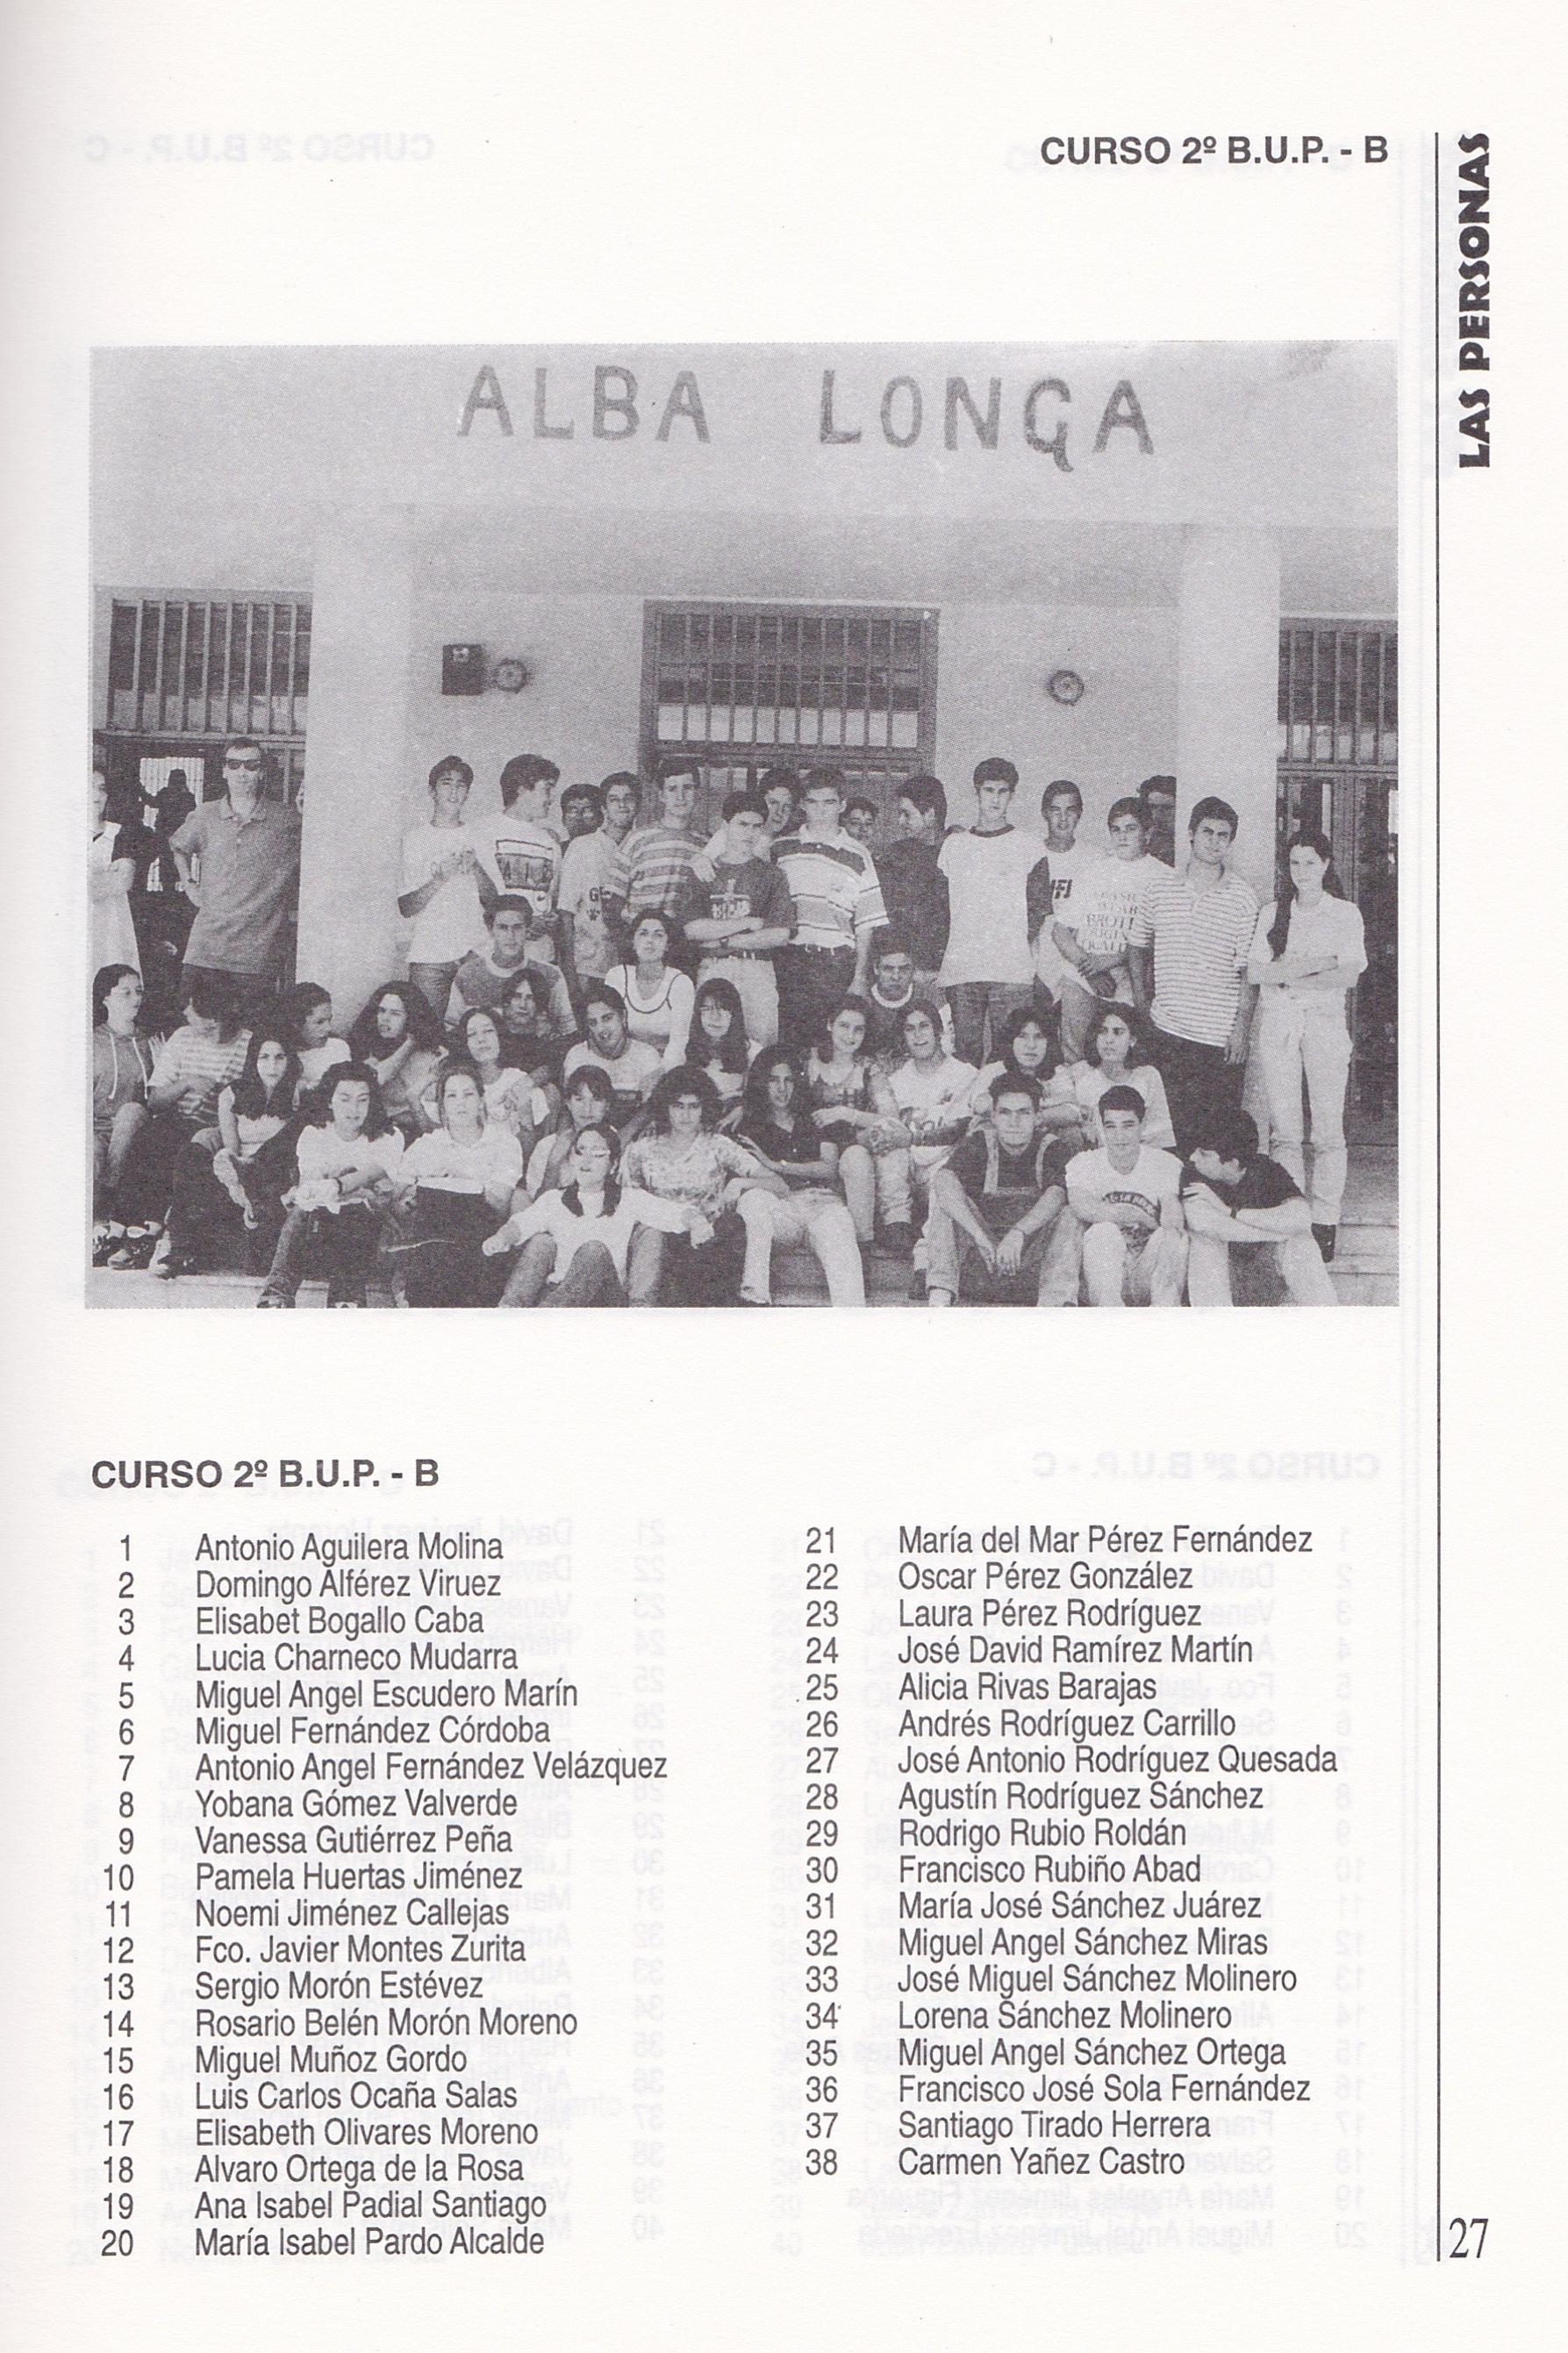 2ºBUP B (curso 1995-1996)